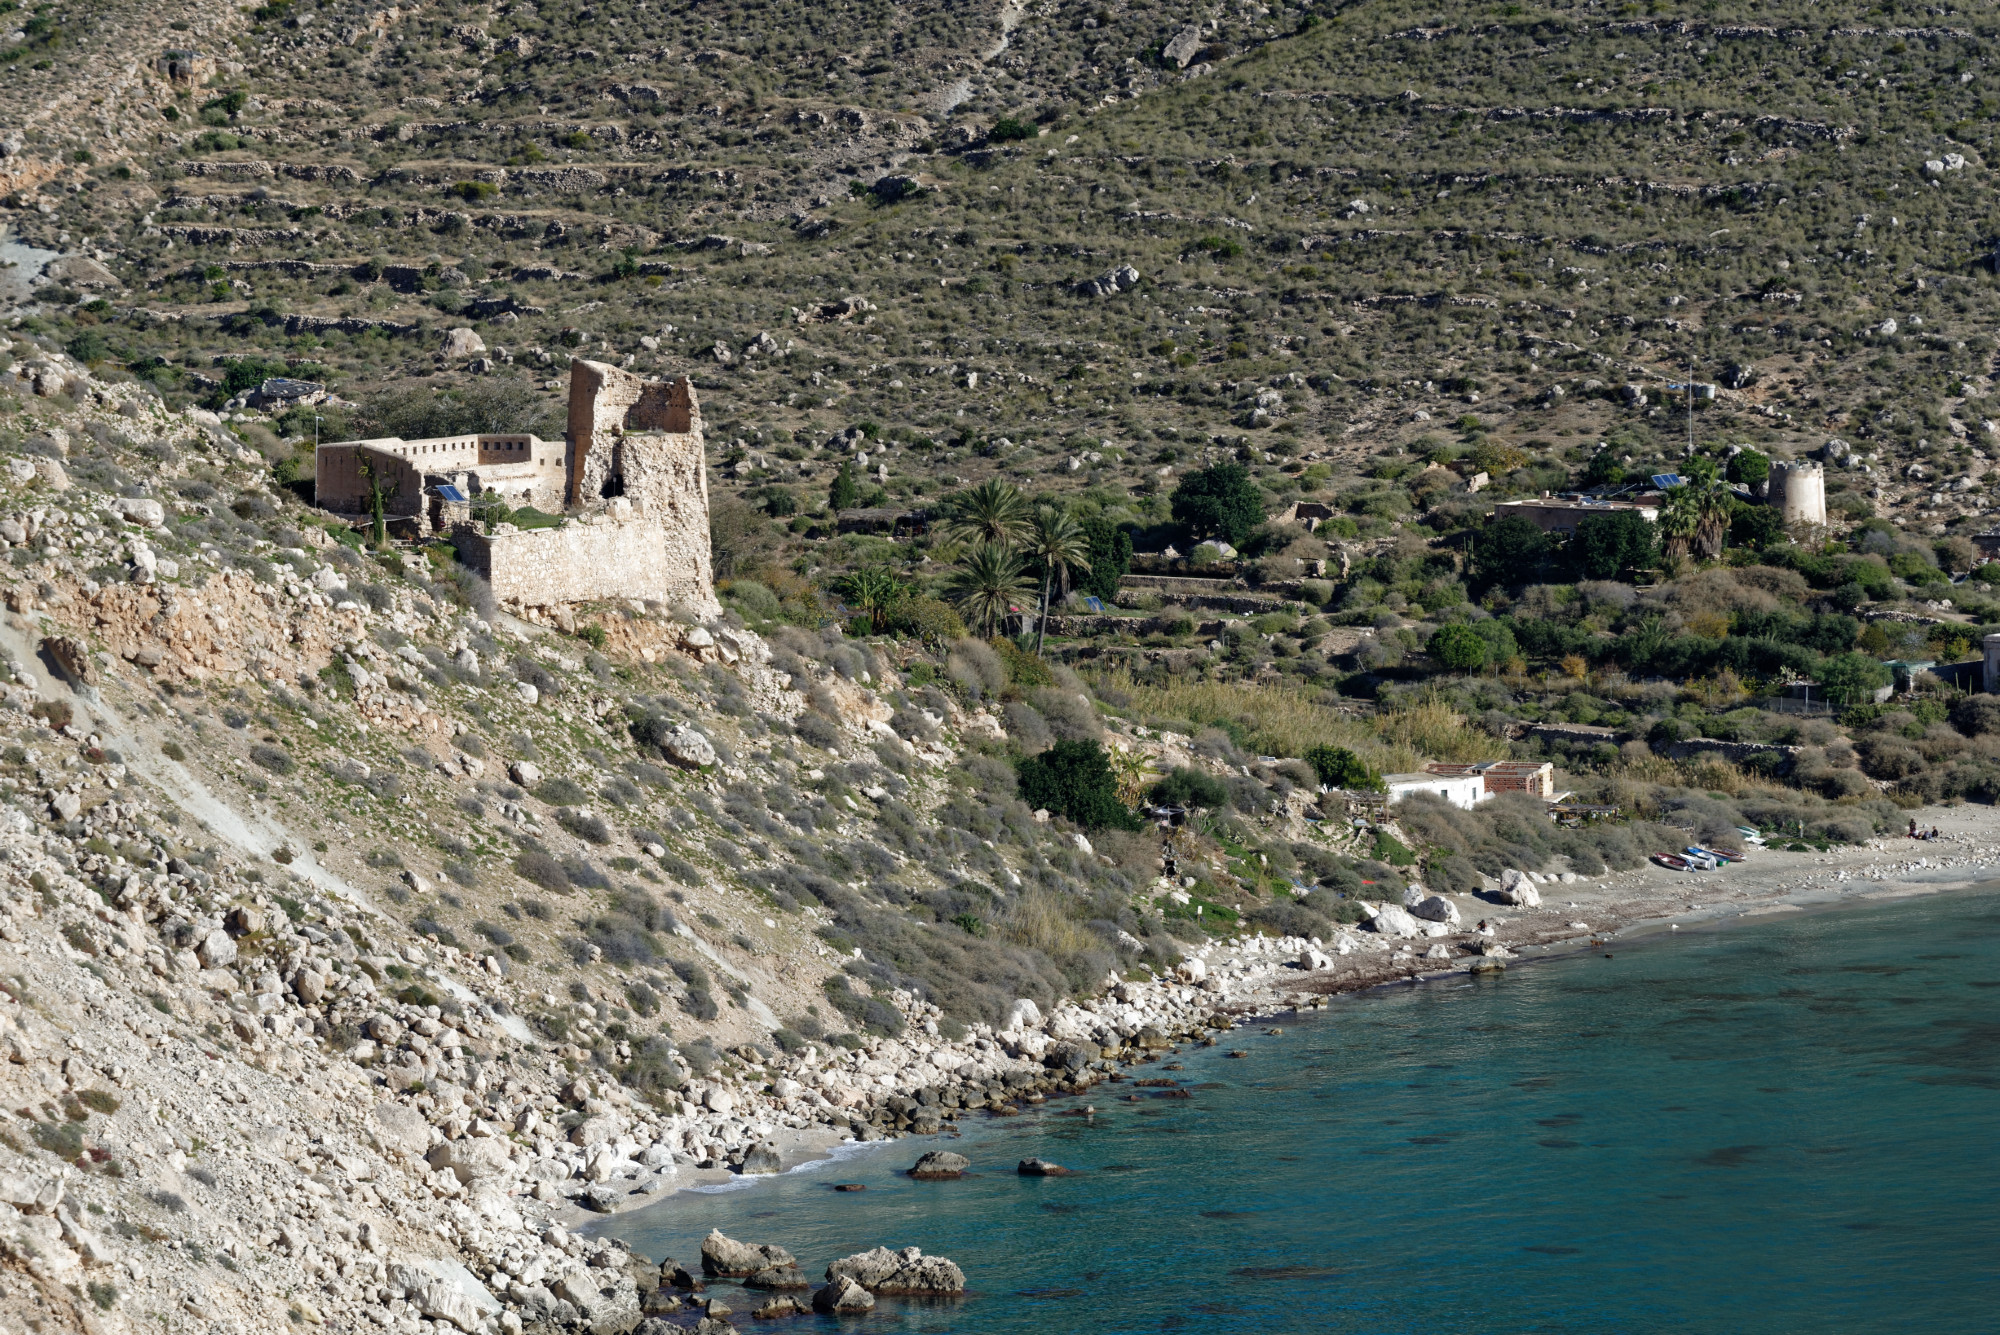 171213-Marche Las Negras-Cala San Pedro-Las Negras (31) (Cabo de Gata-Andalousie)